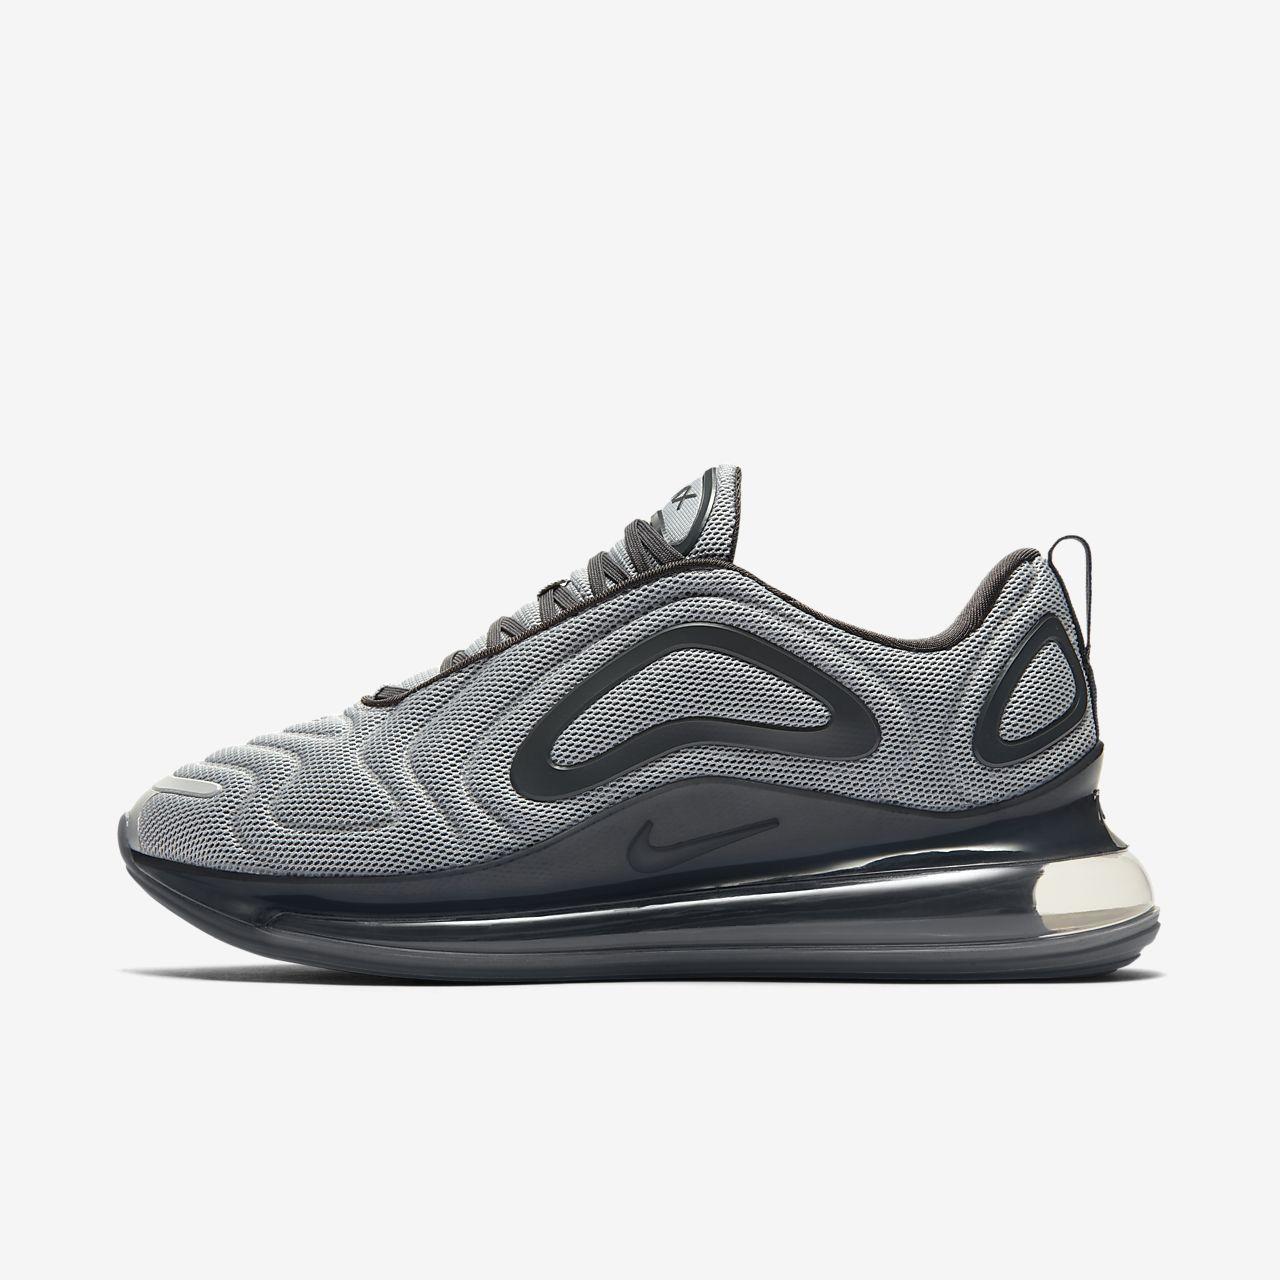 Nike Air Max 720 Chaussure pour Homme Femme Gris Gris